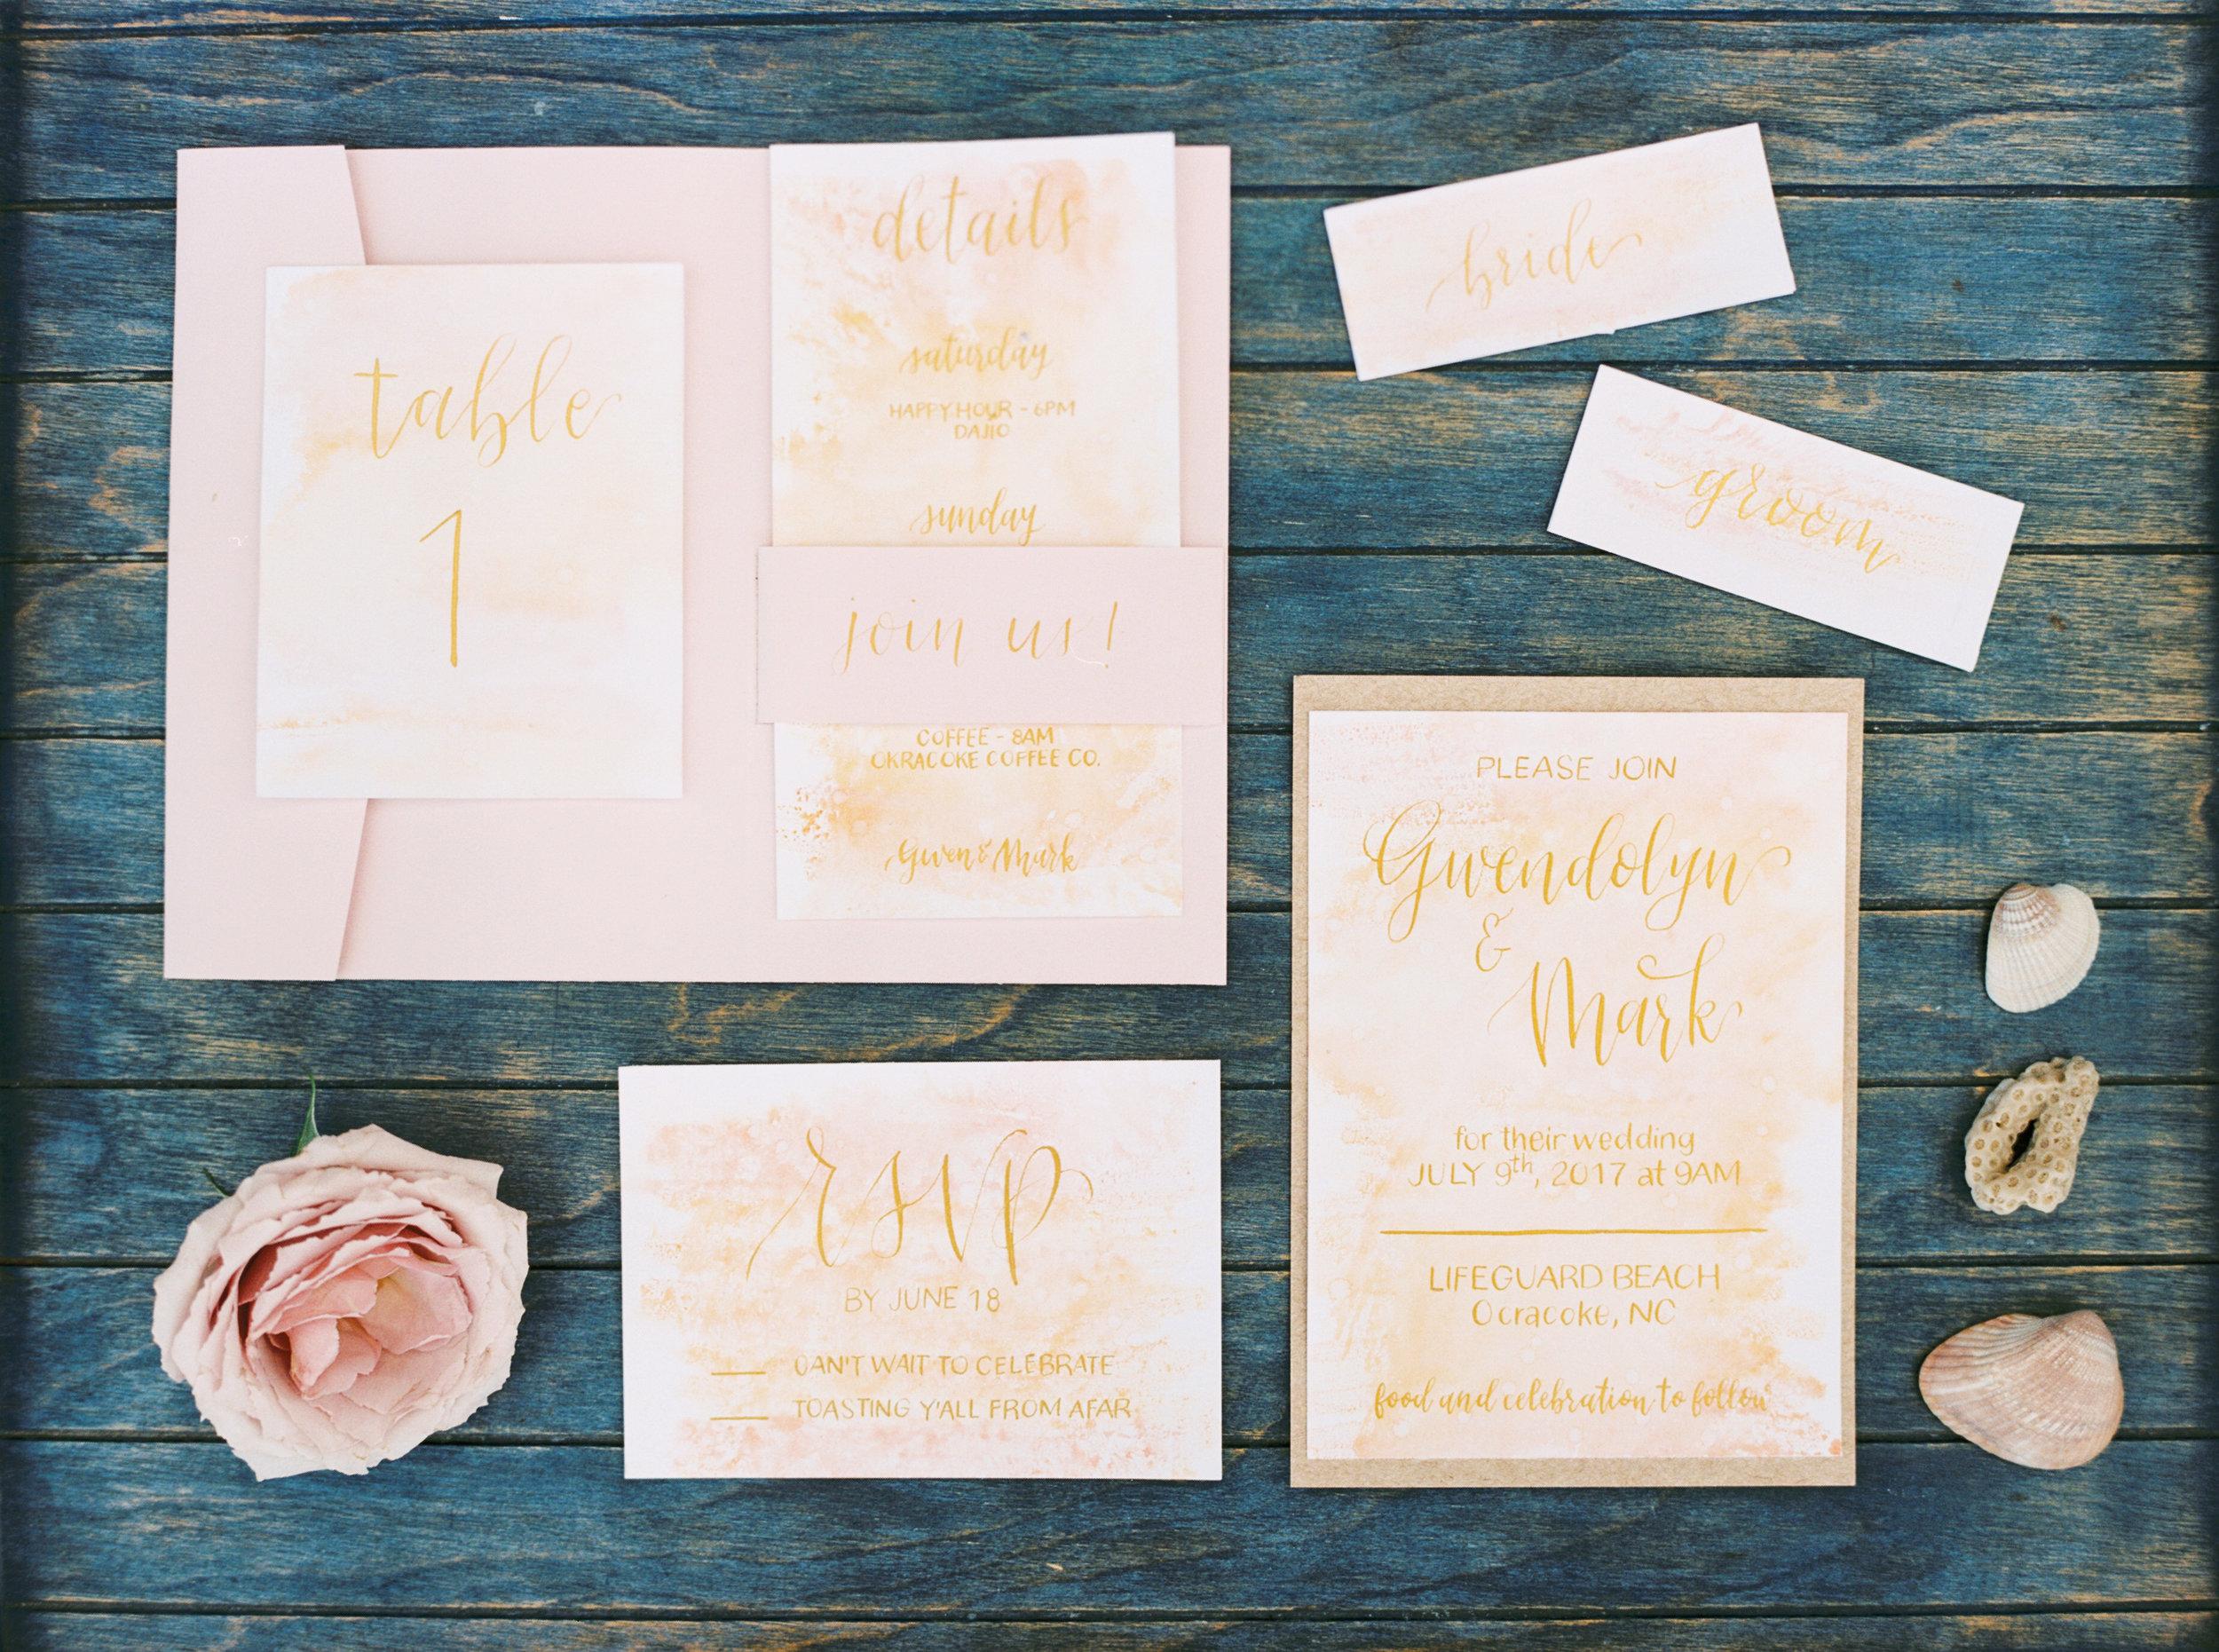 Engaged-Asheville-Joy-Unscripted-Wedding-Calligrapher-Rachael-McIntosh-Photography-5.jpg